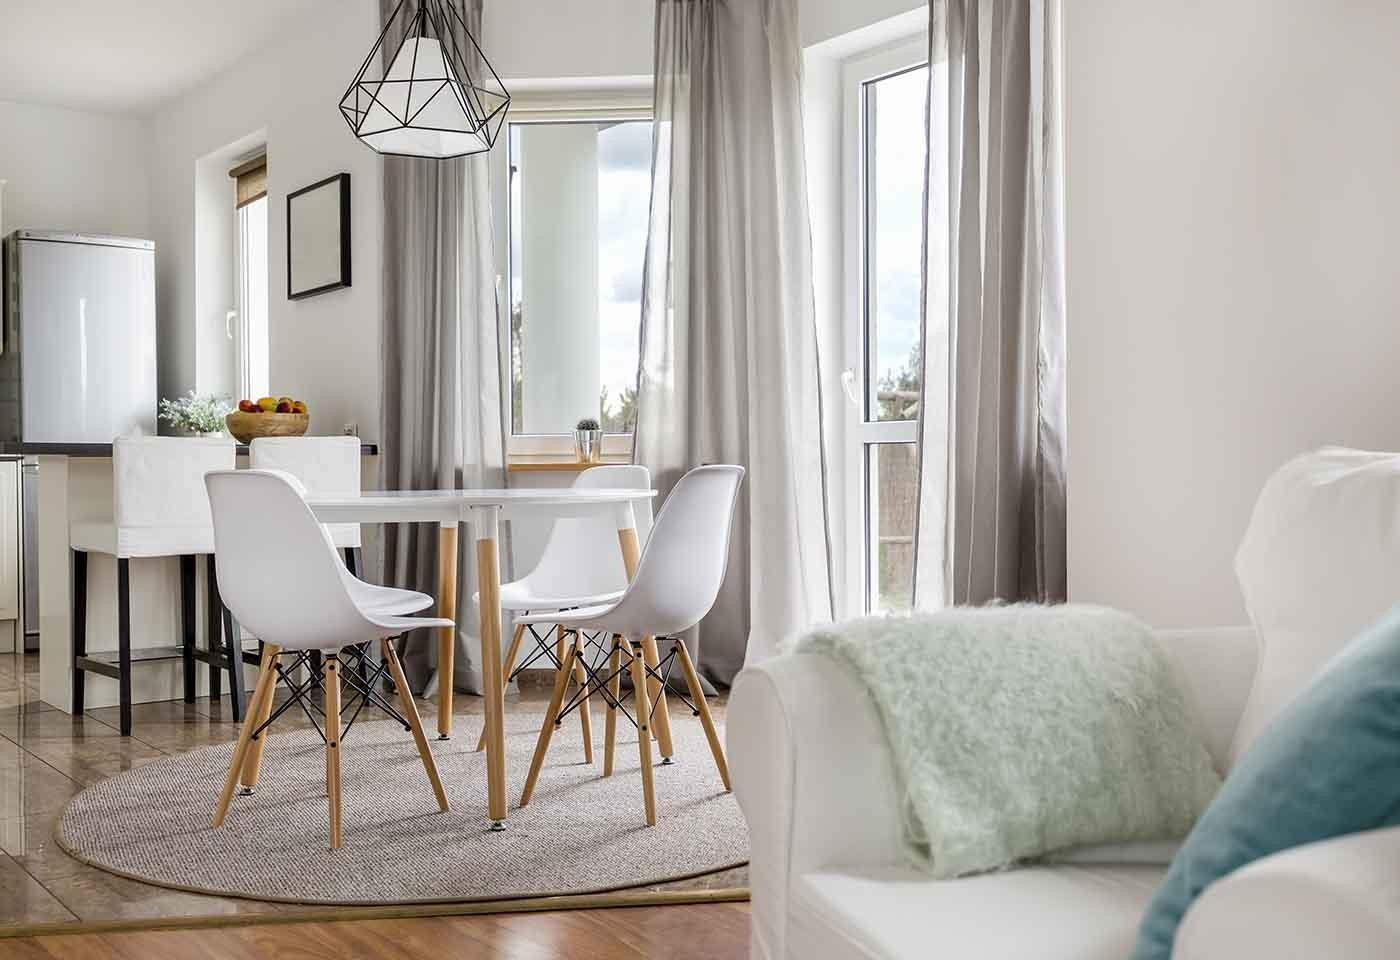 Divano E Tavolo Insieme rinnovare la zona pranzo: meglio tavolo rotondo o tavolo